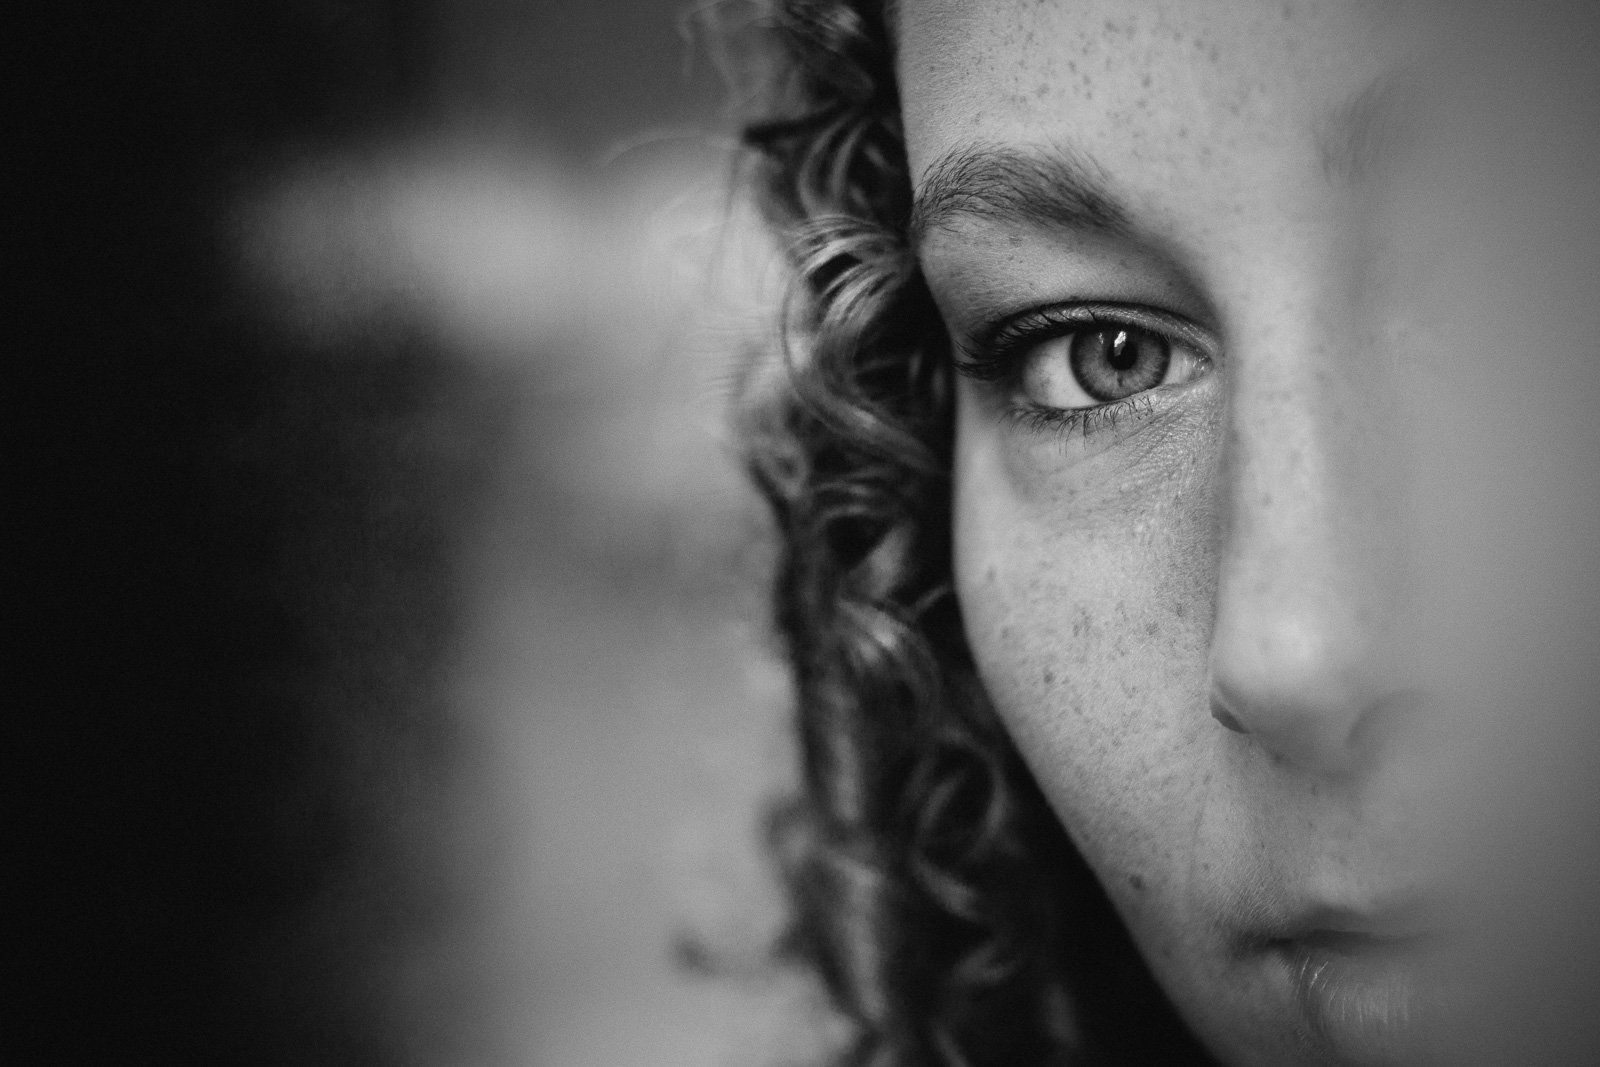 Kristina - Rock'n'Klick - Andreas Völker Fotograf Münster - Portraitfotograf Businessfotograf Familienfotograf Hochzeitsfotograf - Portraitfotos Businessfotos Familienfotos Hochzeitsfotos